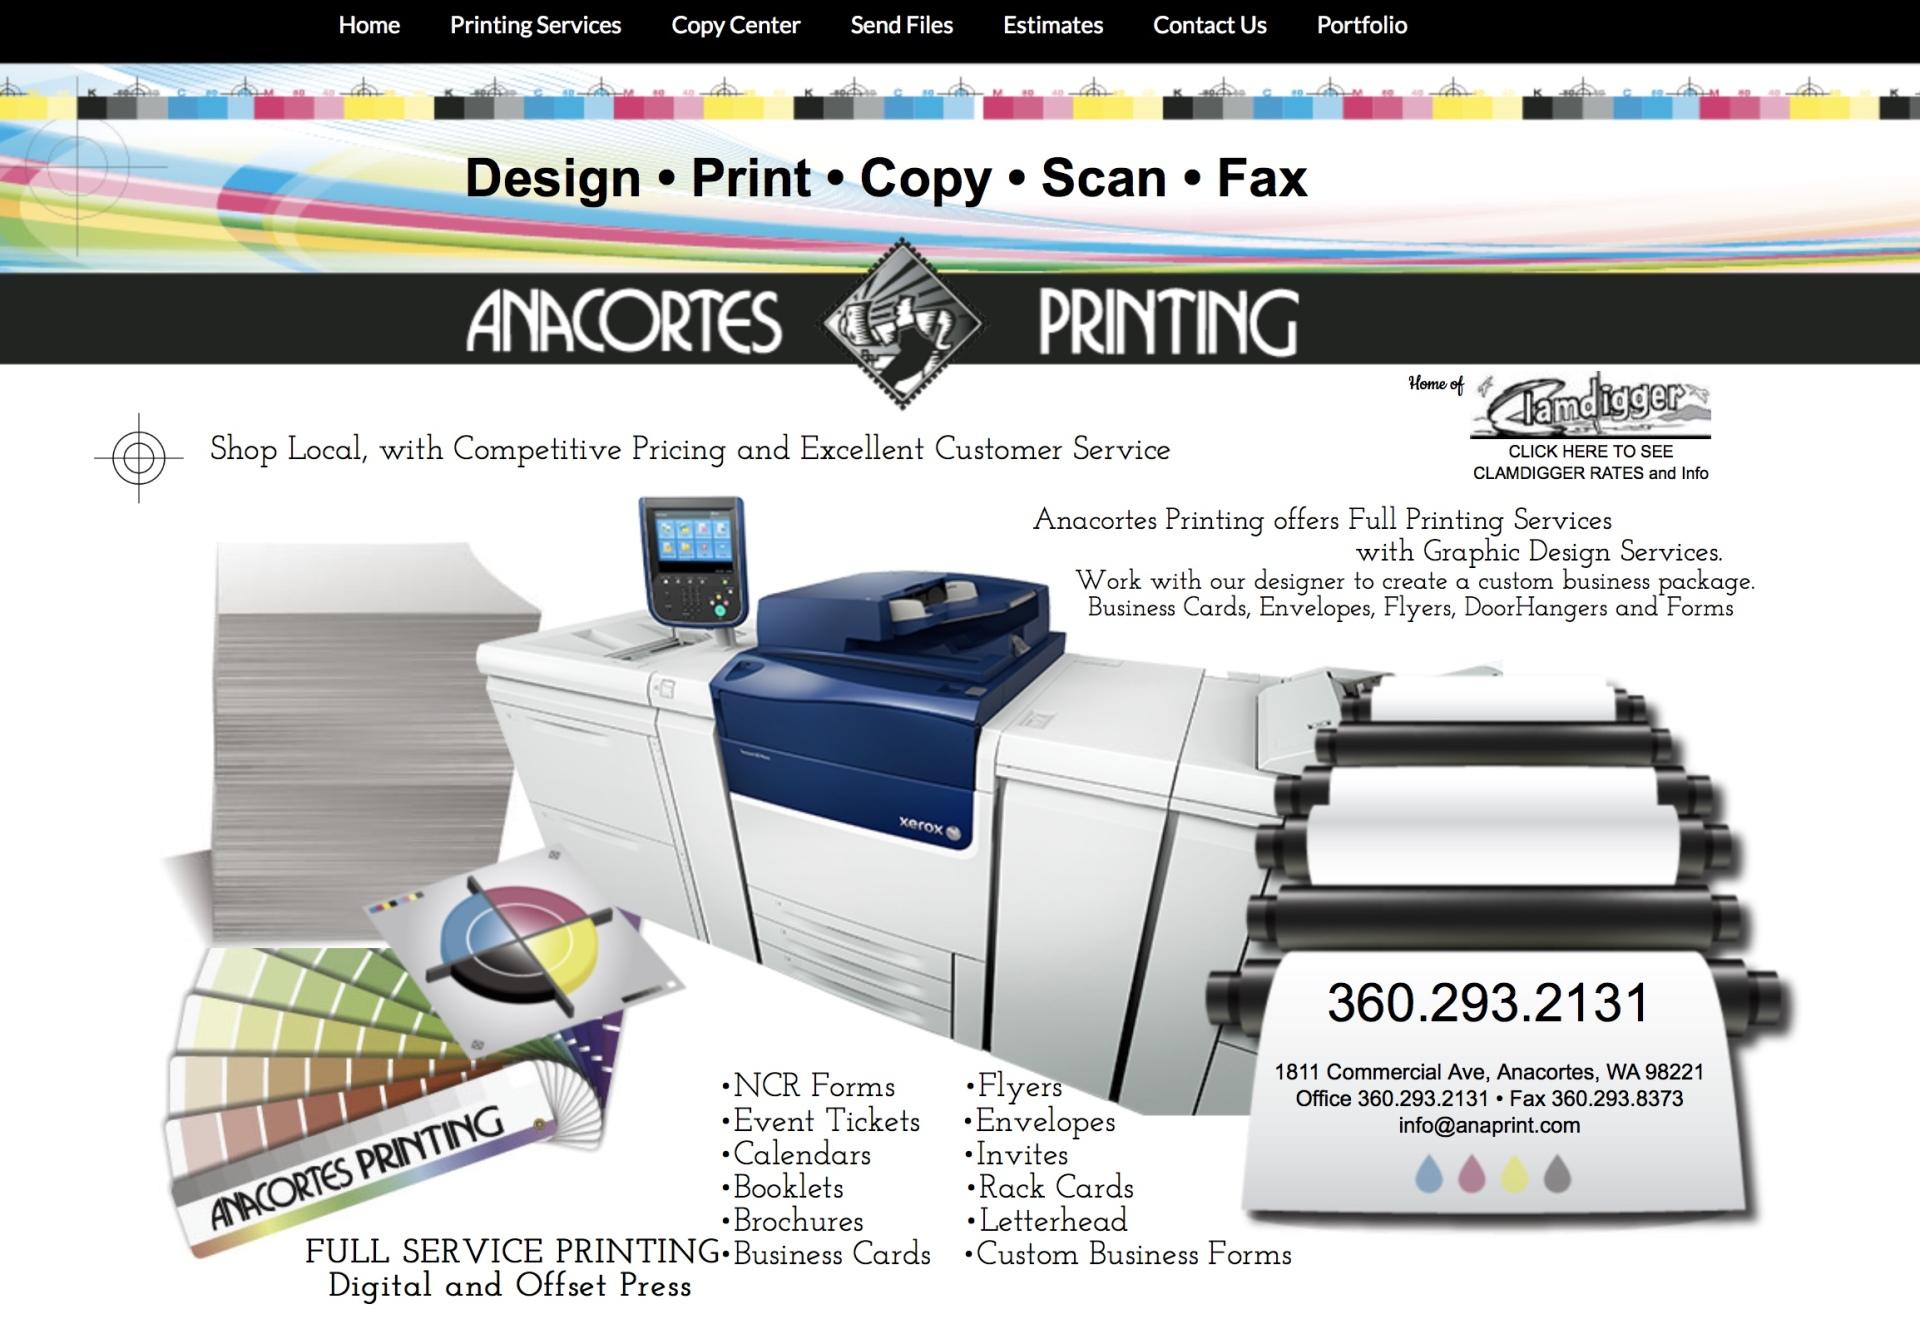 AnacortesPrinting